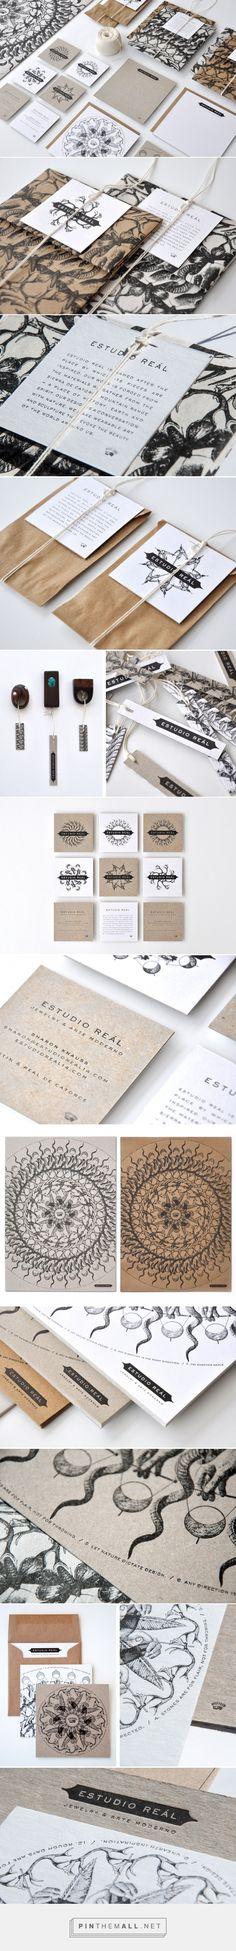 Estudio Real Branding by Design Ranch | Fivestar Branding – Design and Branding Agency & Inspiration Gallery